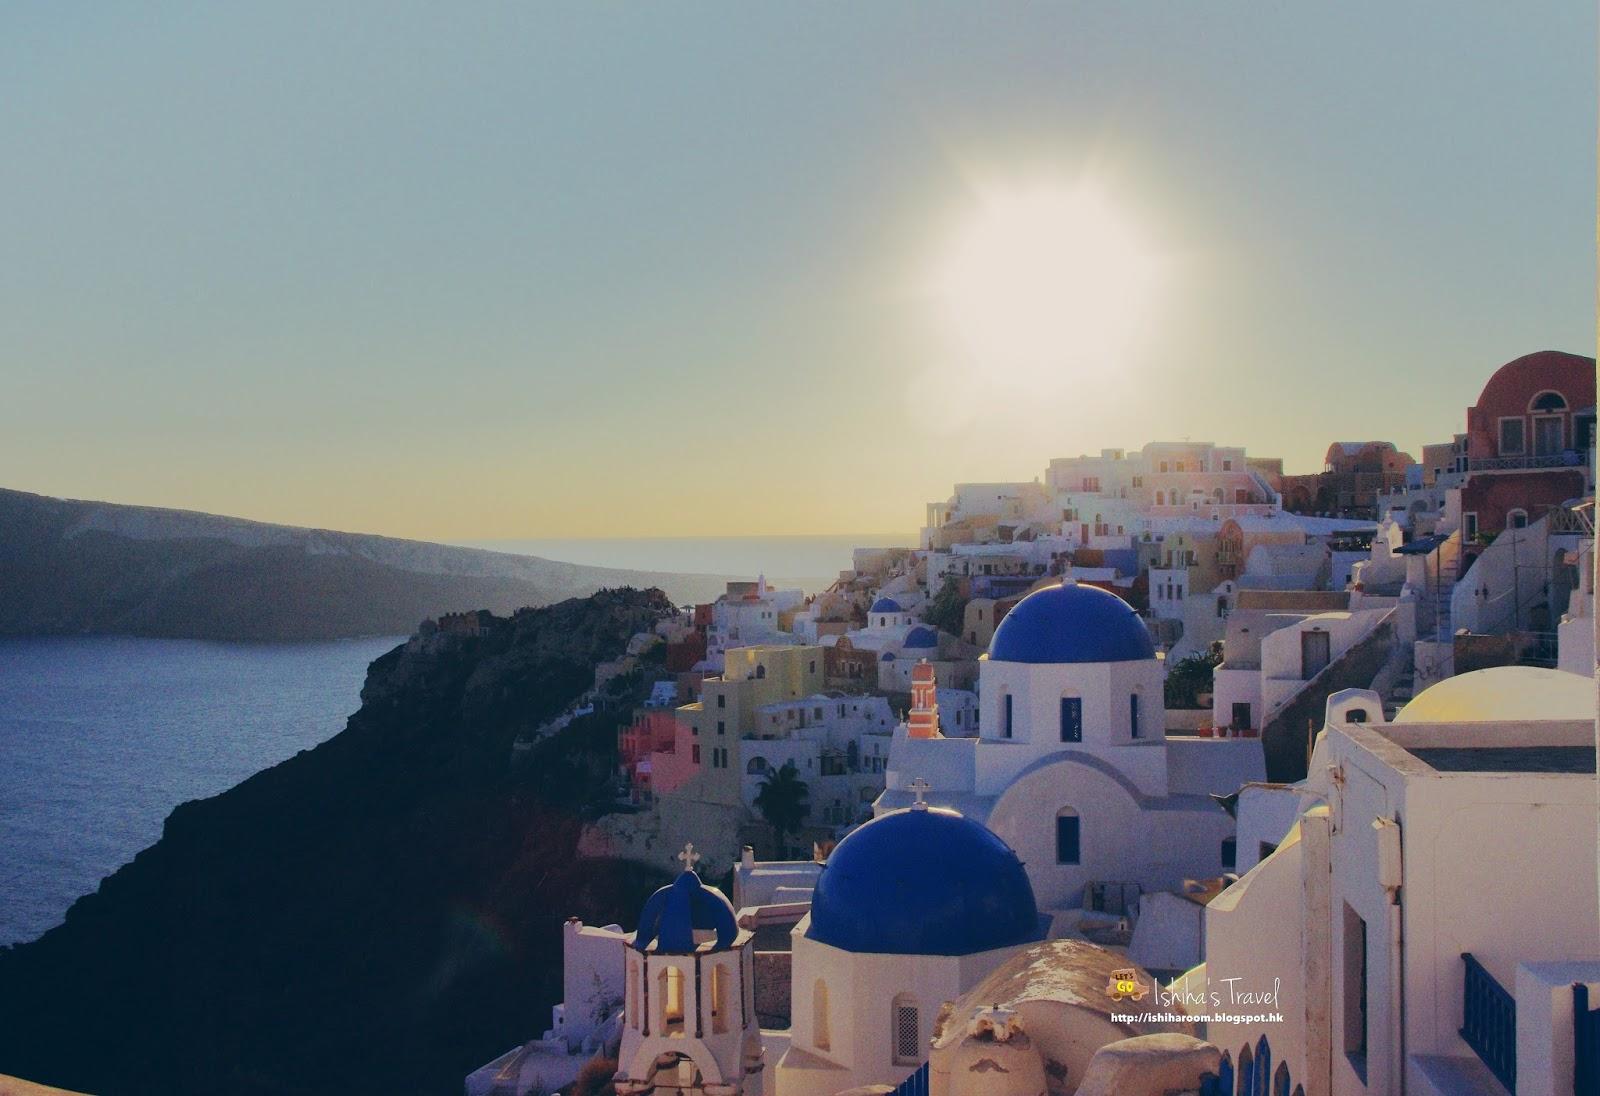 [希臘‧愛琴海] Santorini 聖托里尼自駕遊: Oia日落之旅 | Welcome to Ishiha Wanderlust